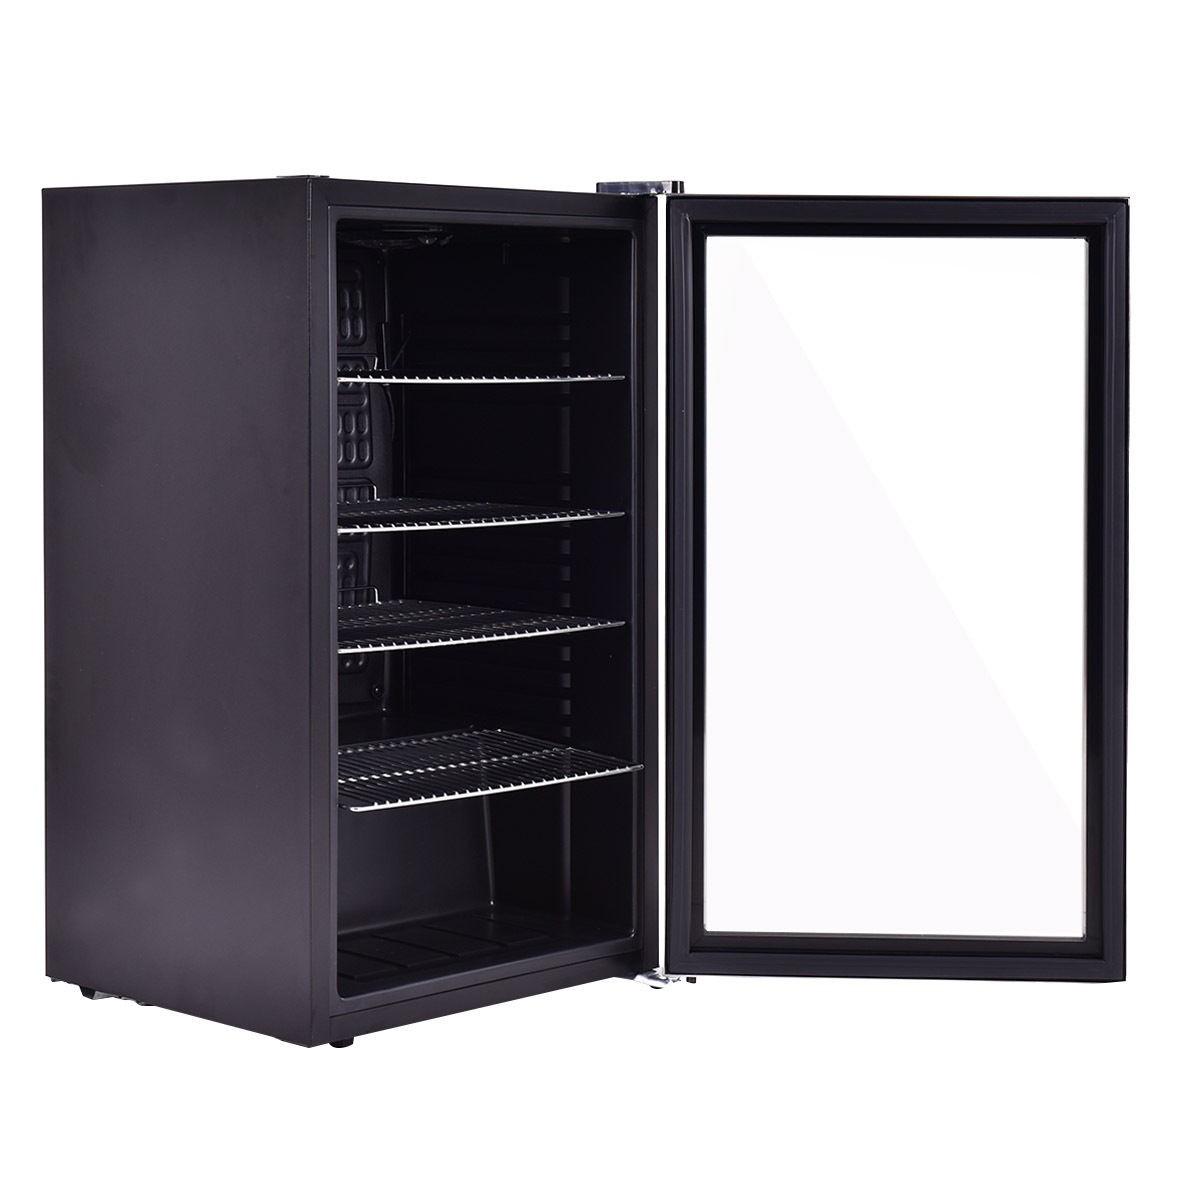 120can Beverage Refrigerator Drink Soda Beer Wine Cooler